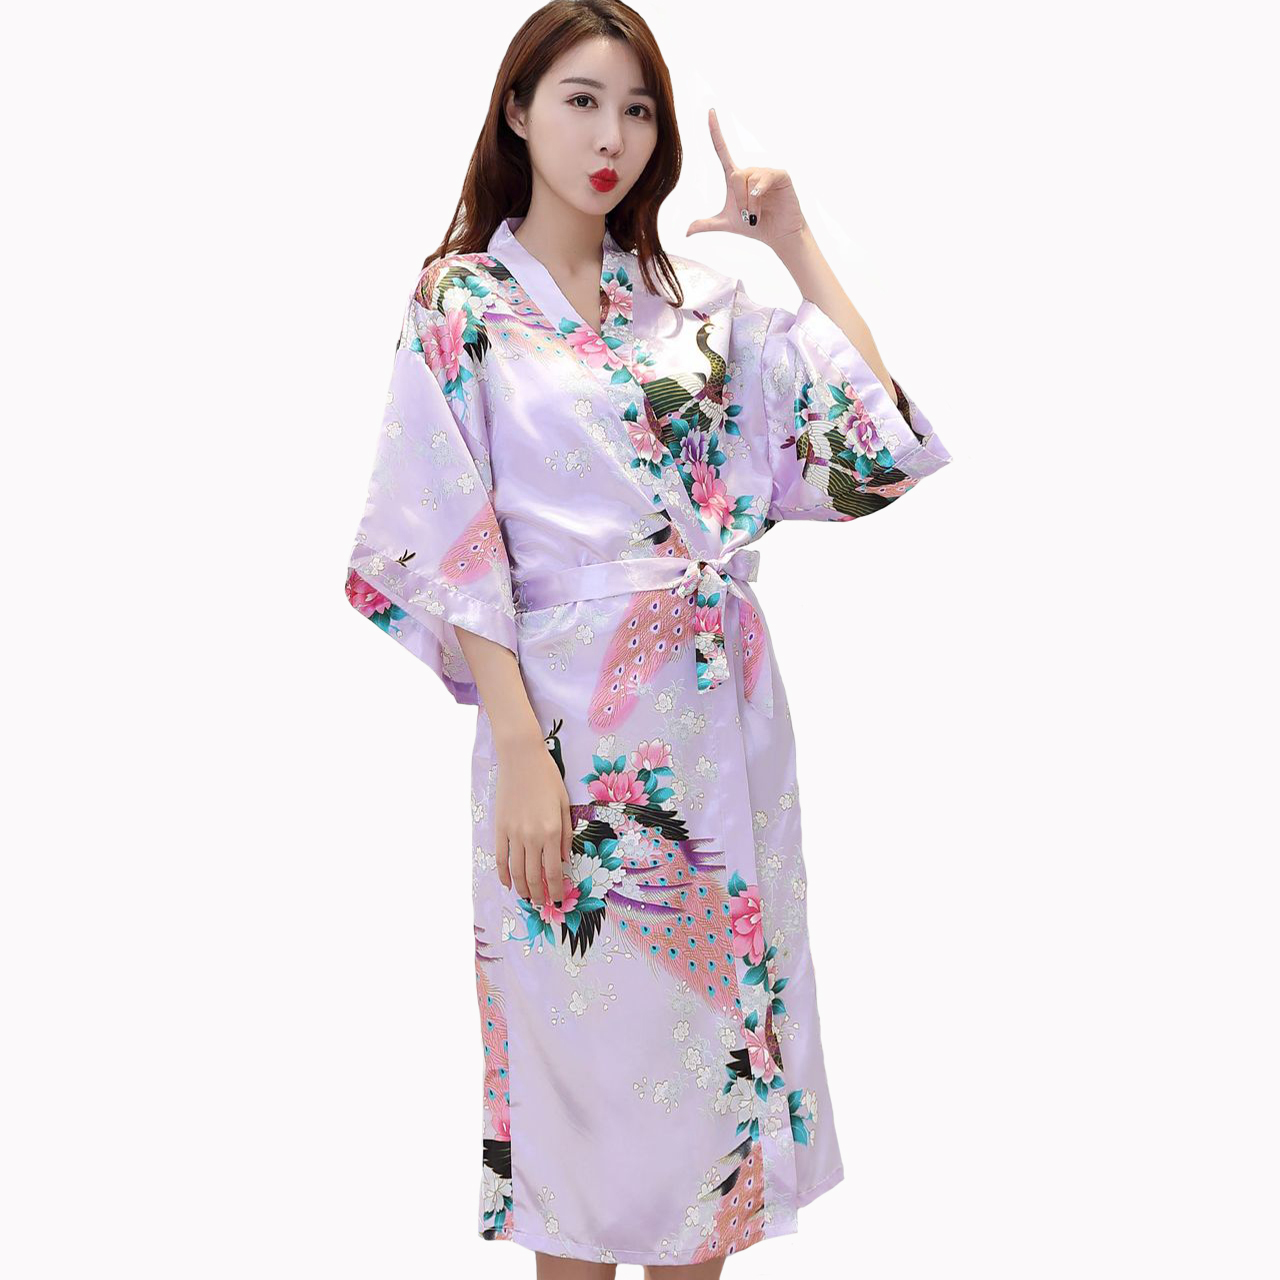 Chinese Silk Women/'s Long Kimono Peacock Robe Gown bathrobe Sleepwear Plus size